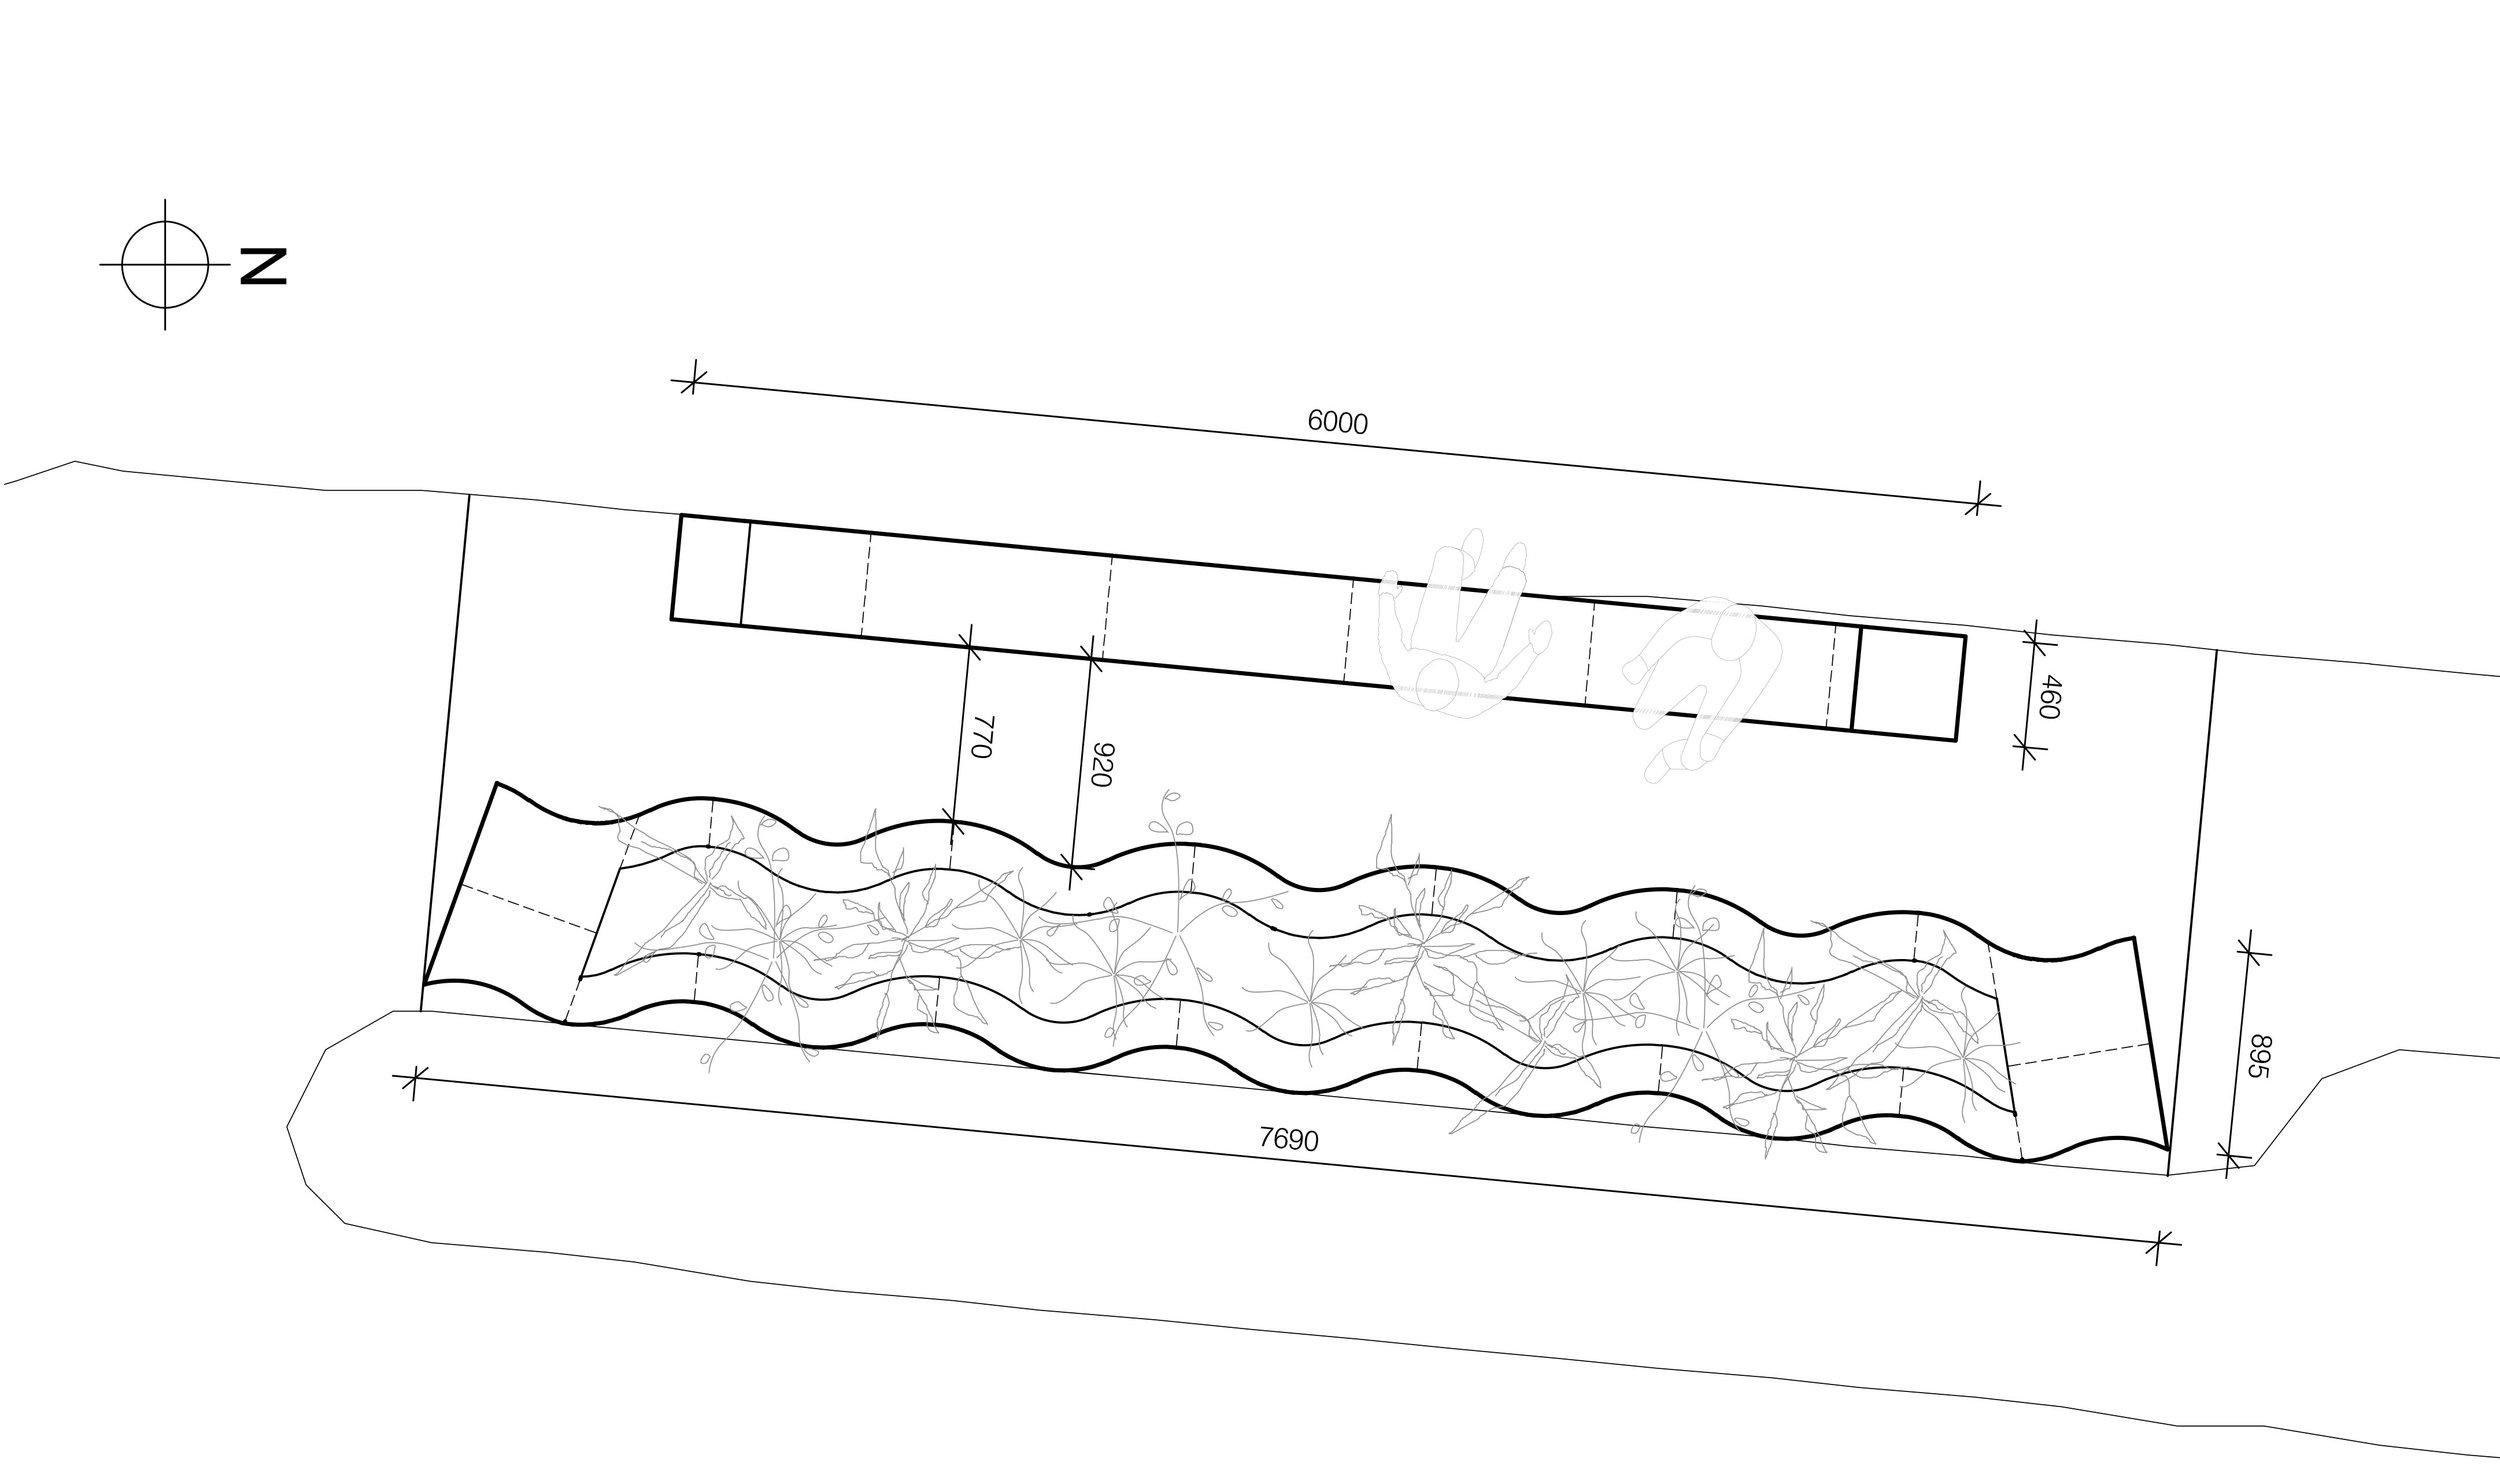 19_City of London Parklets_Drawing 4.jpg